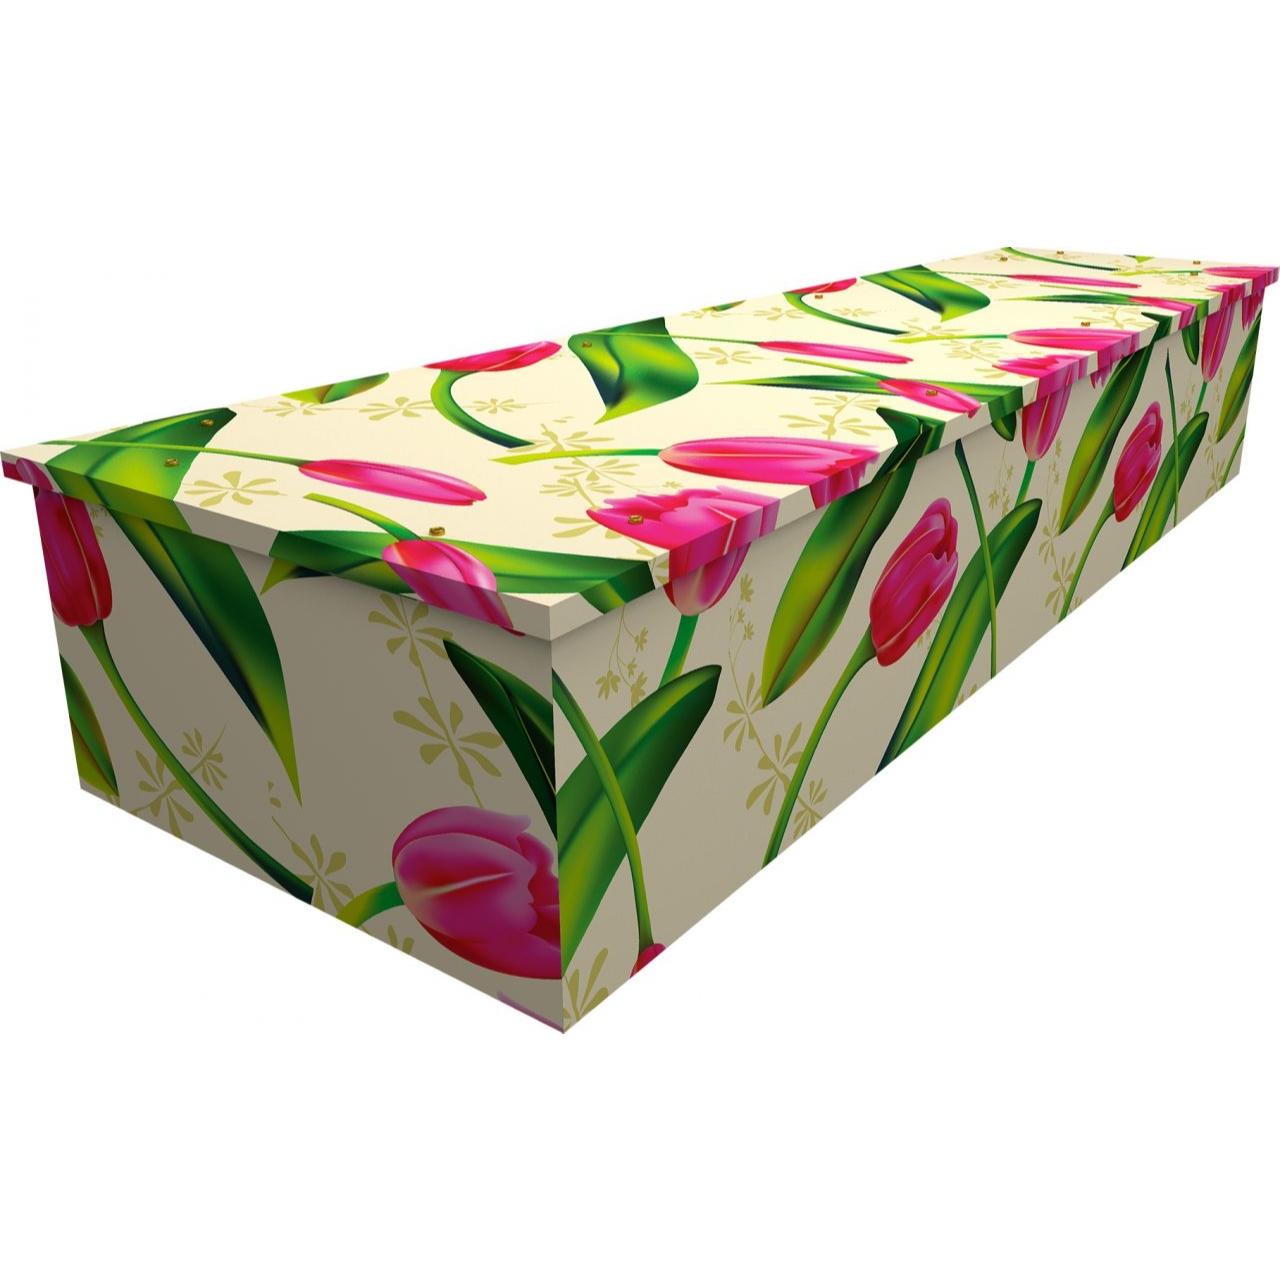 Tulip Pattern Cardboard Coffin